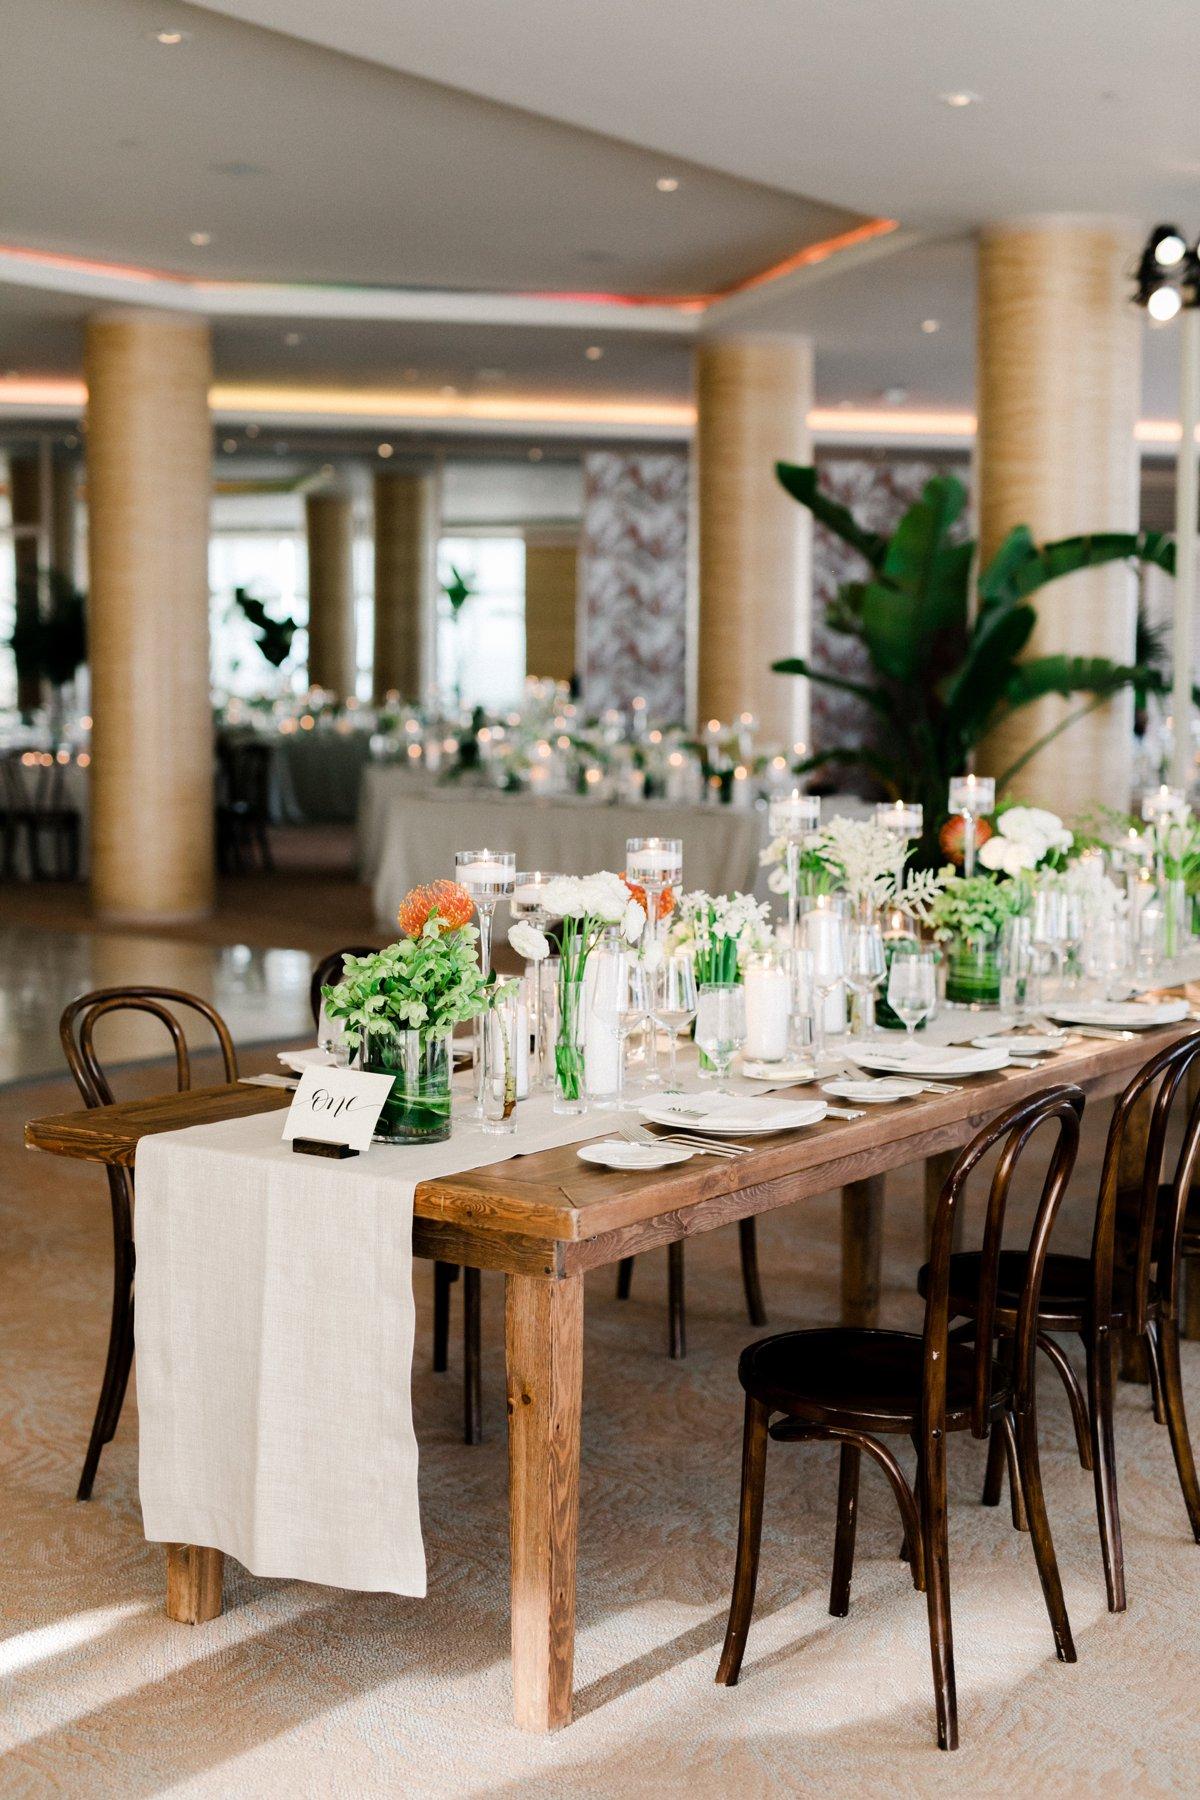 tropical inspired wedding receptions - photo by Anna Delores https://ruffledblog.com/chic-modern-wedding-at-four-seasons-santa-barbara